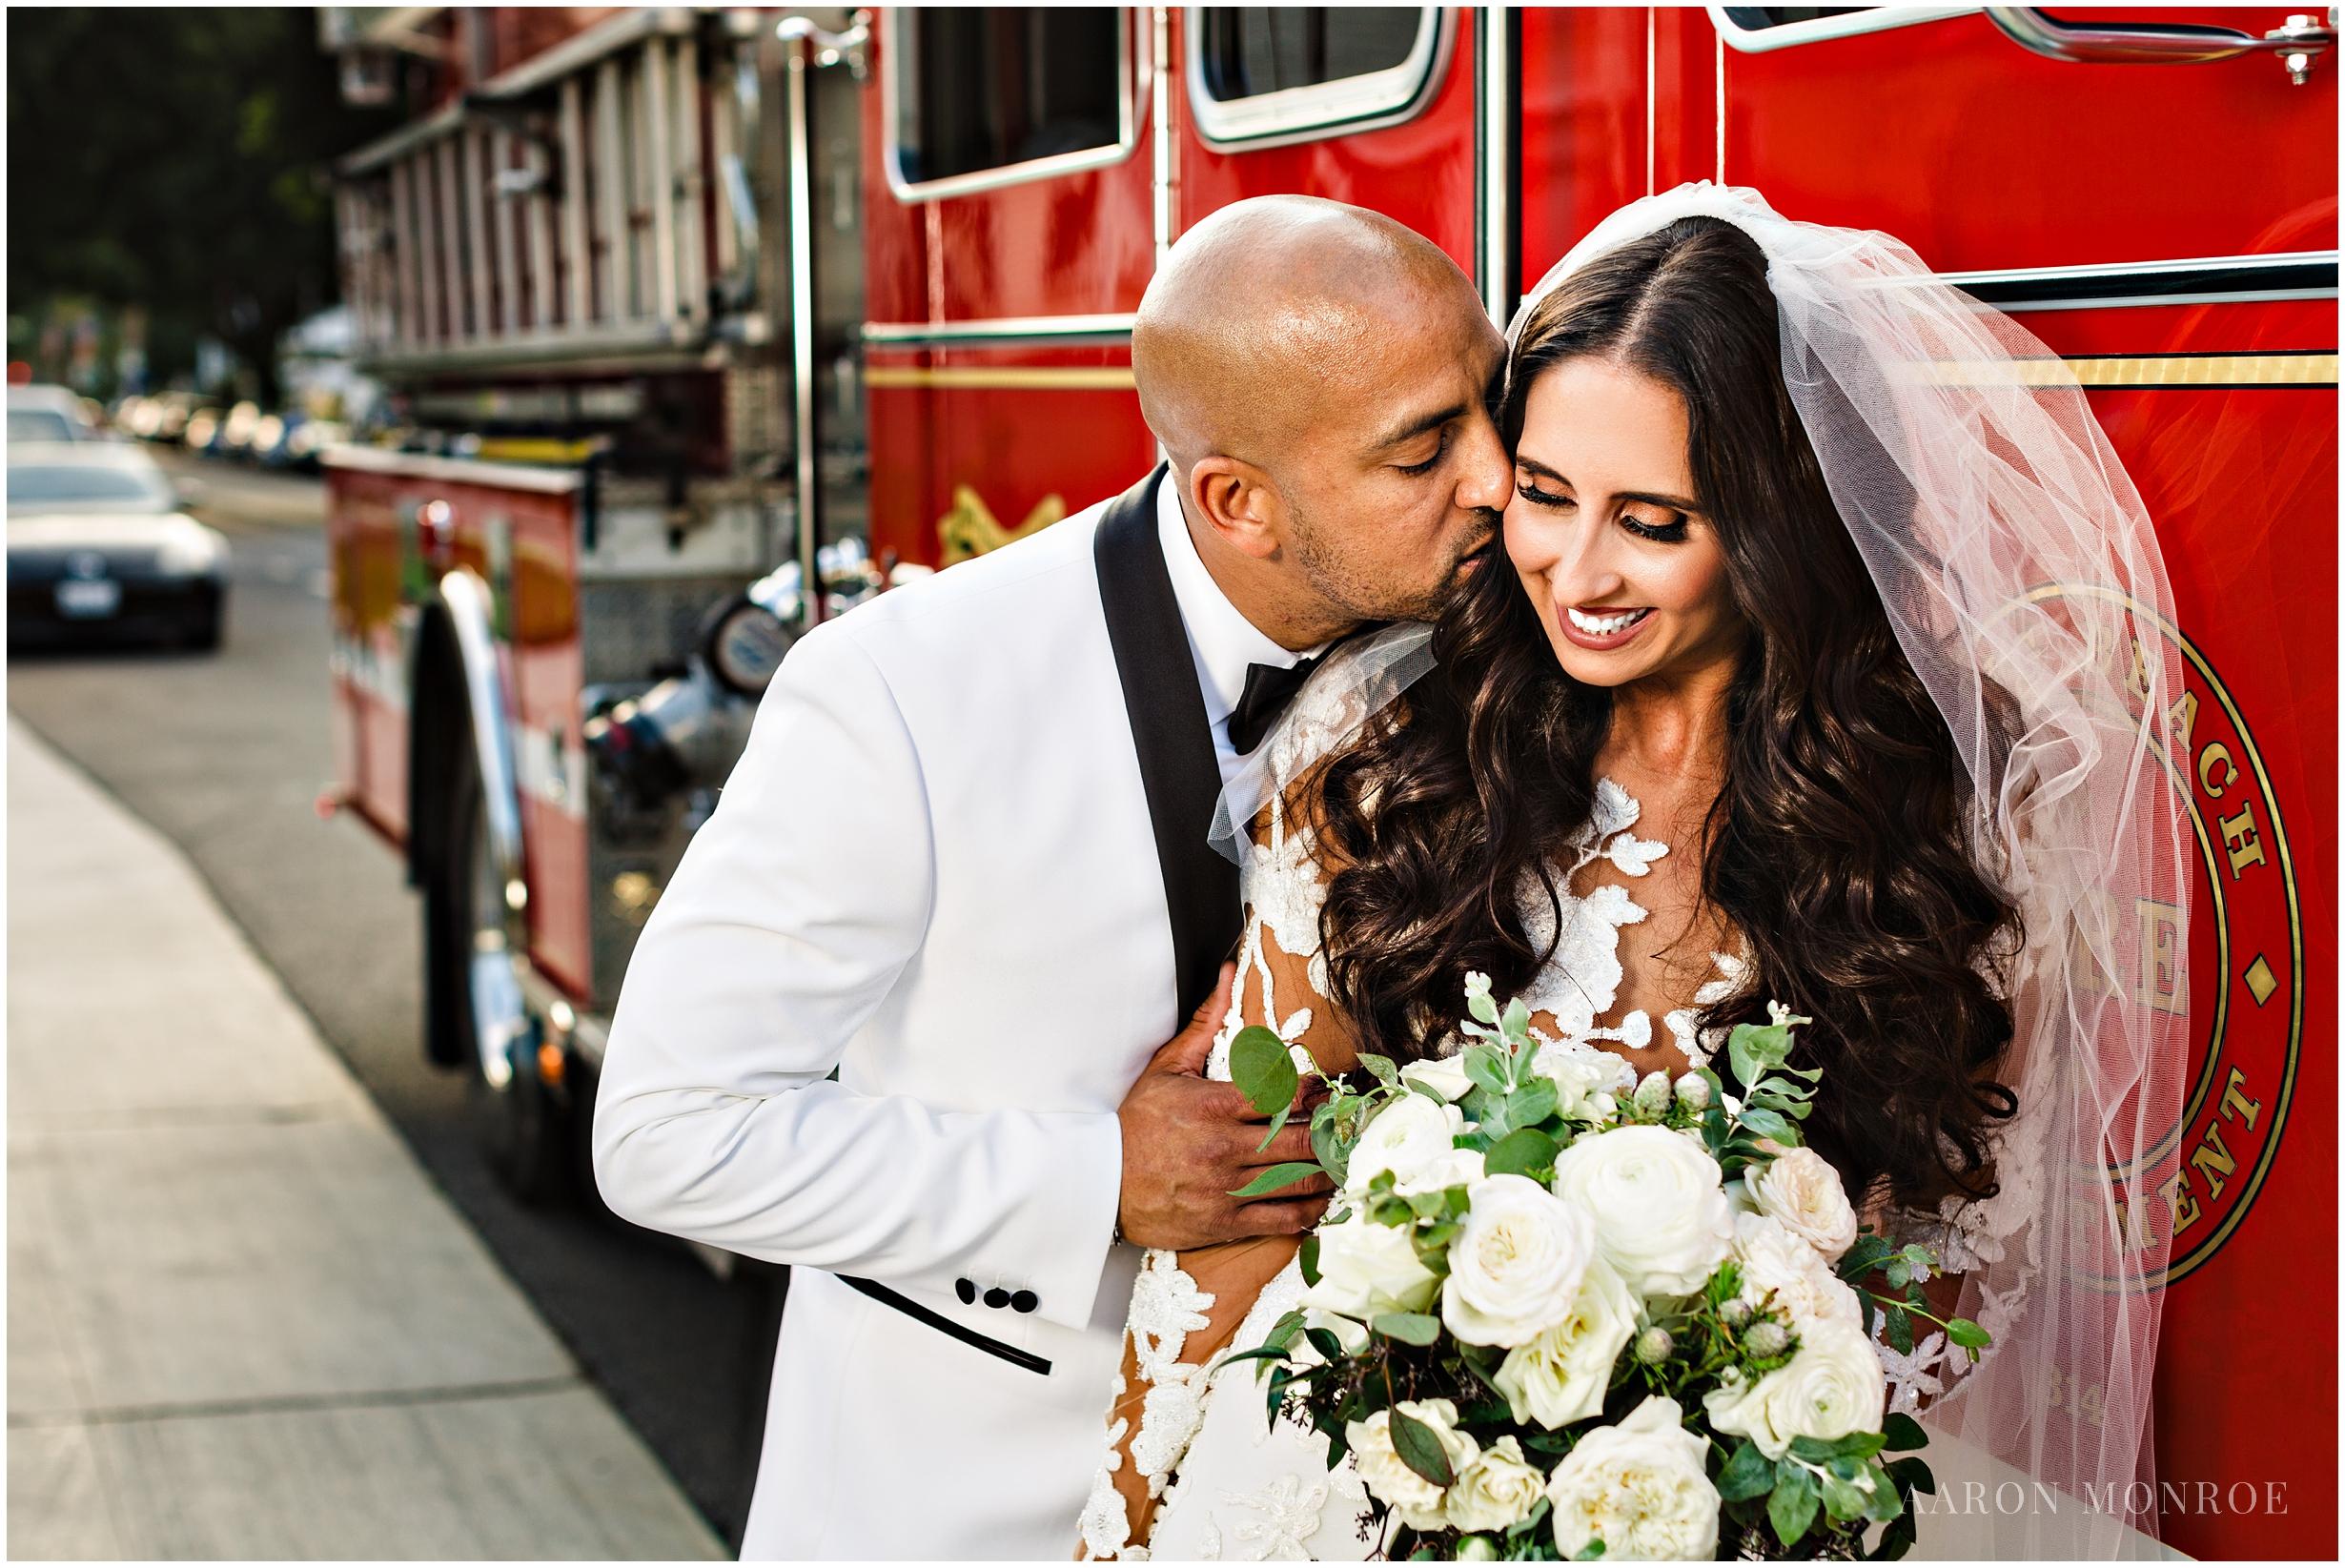 Ebell_Long_Beach_Wedding_Photography_0854.jpg